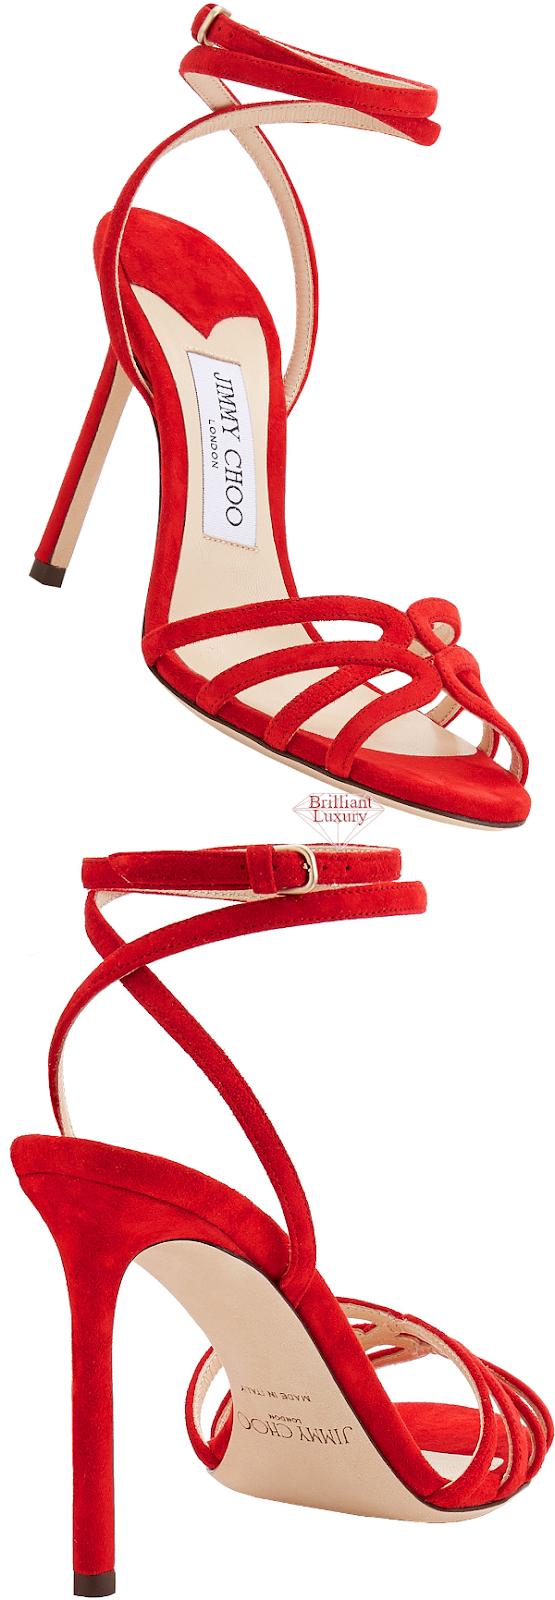 Jimmy Choo Mimi Red Suede Wrap Around Sandal #brilliantluxury